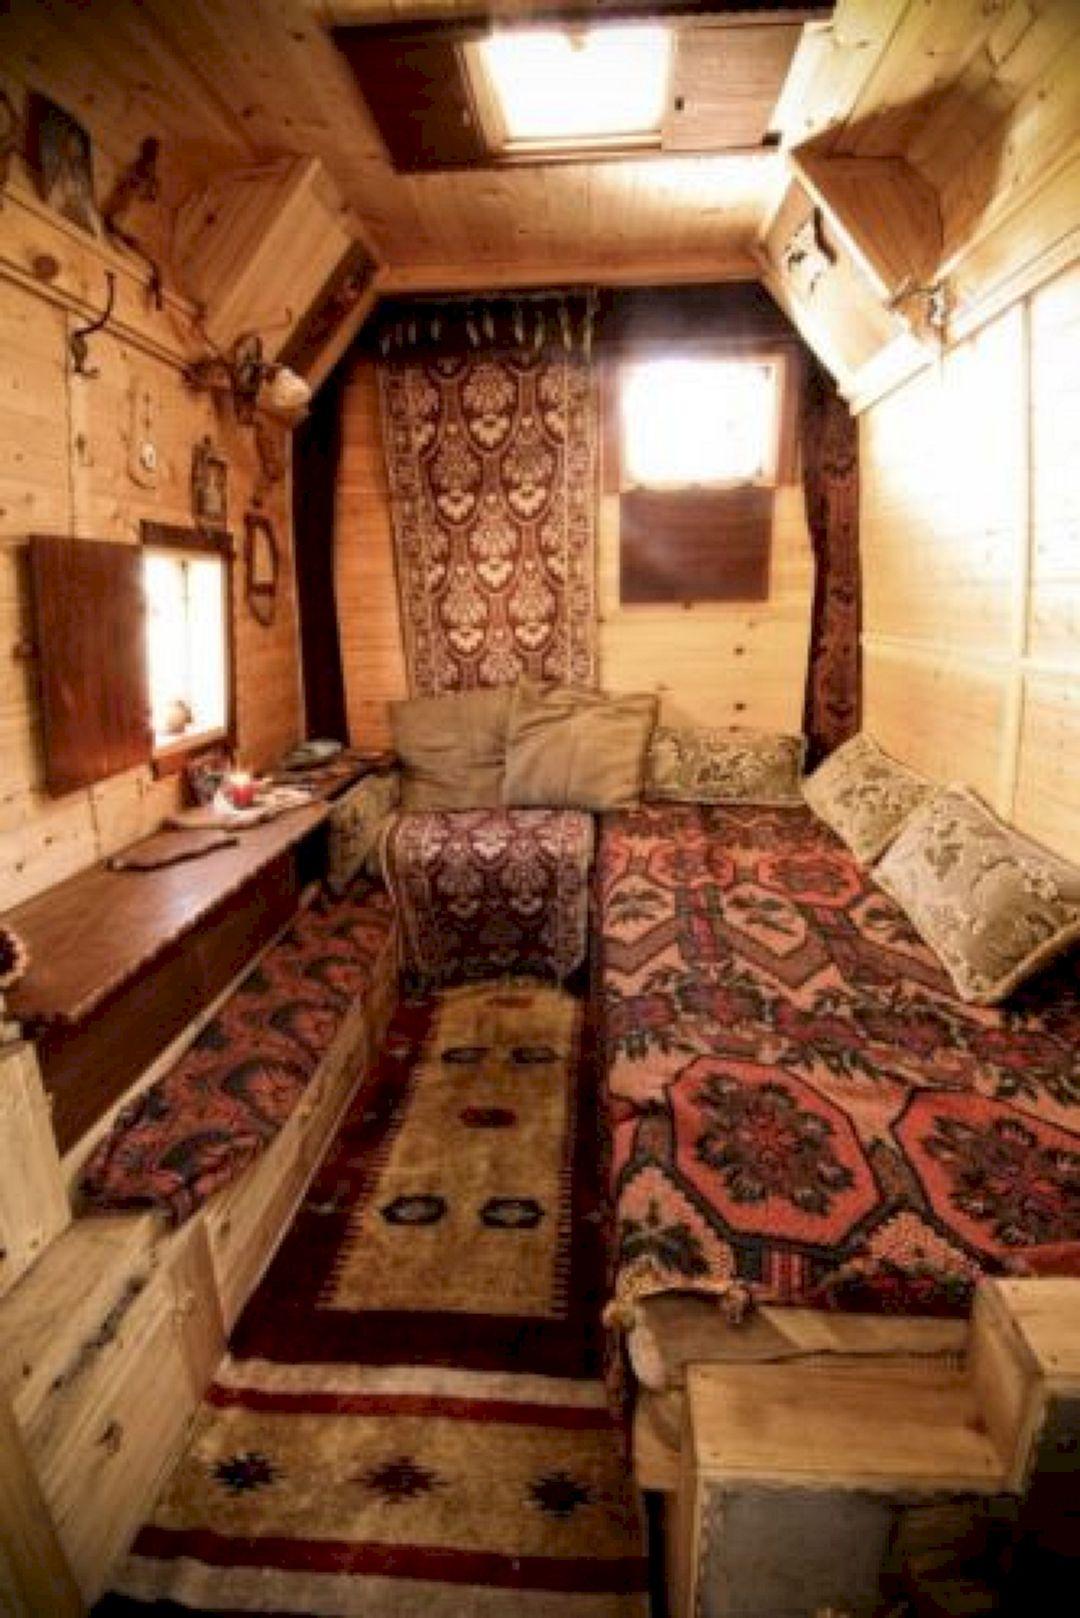 Interior Design Ideas For Camper Van No 26 (Interior Design Ideas For Camper Van No 26) design ...